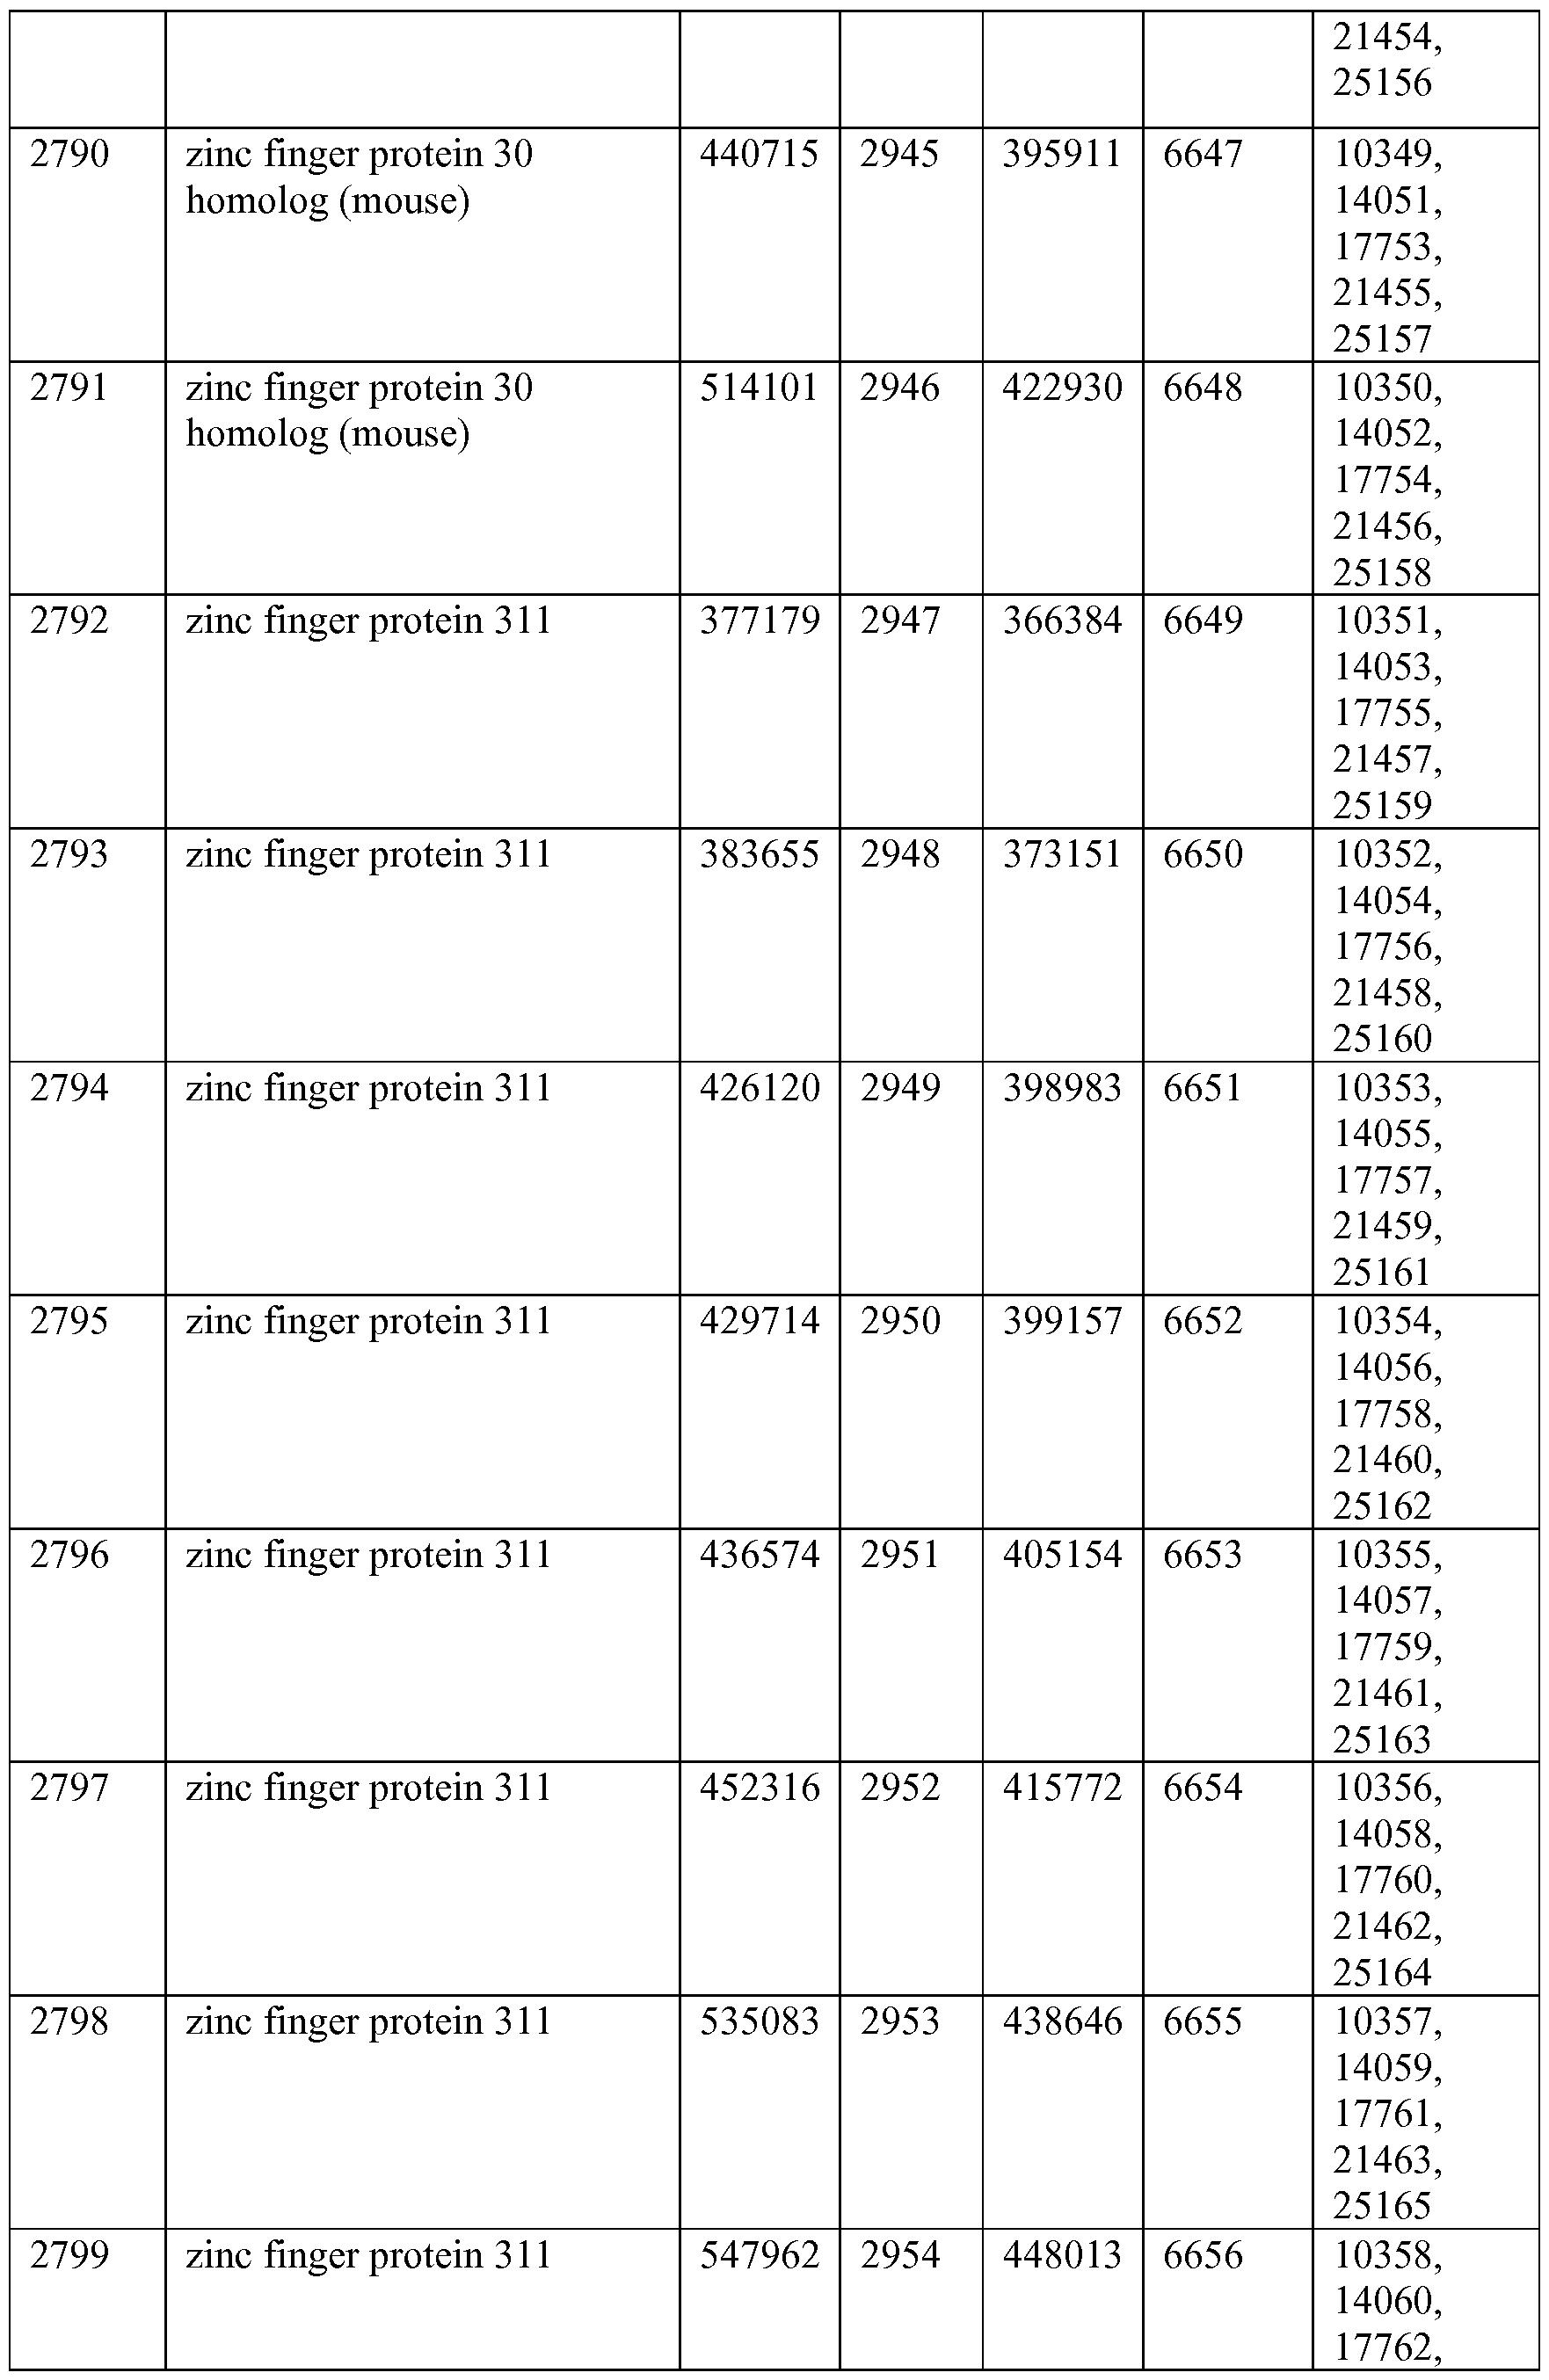 core mangos 10357